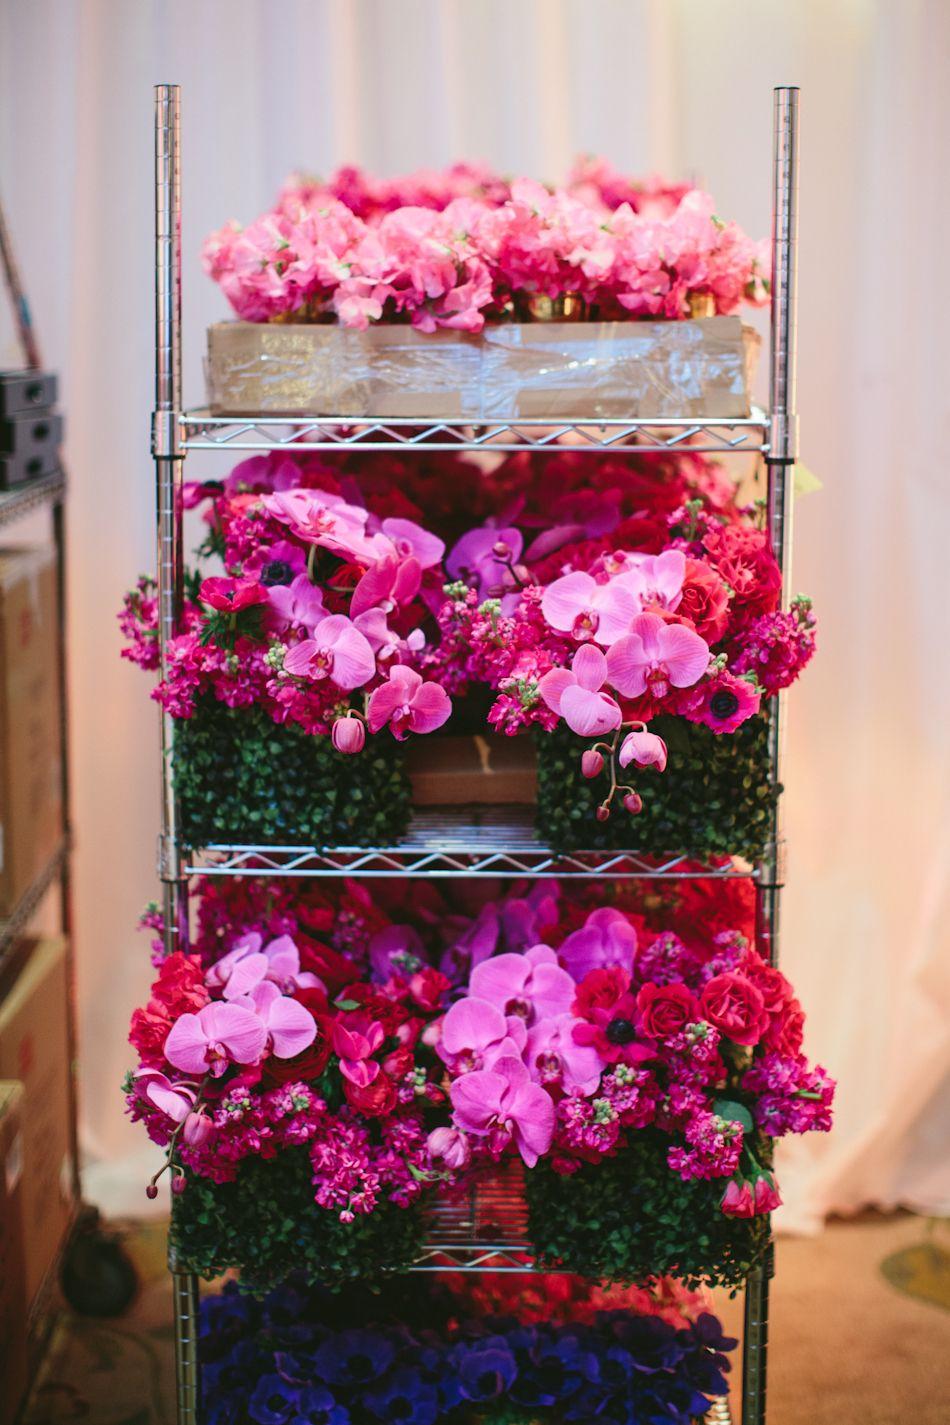 Caravents   www.rjackbalthazar.com unloading bundles of pink floral   ESSENCE BWIH 2014   Photo Credit @paigejonesphoto